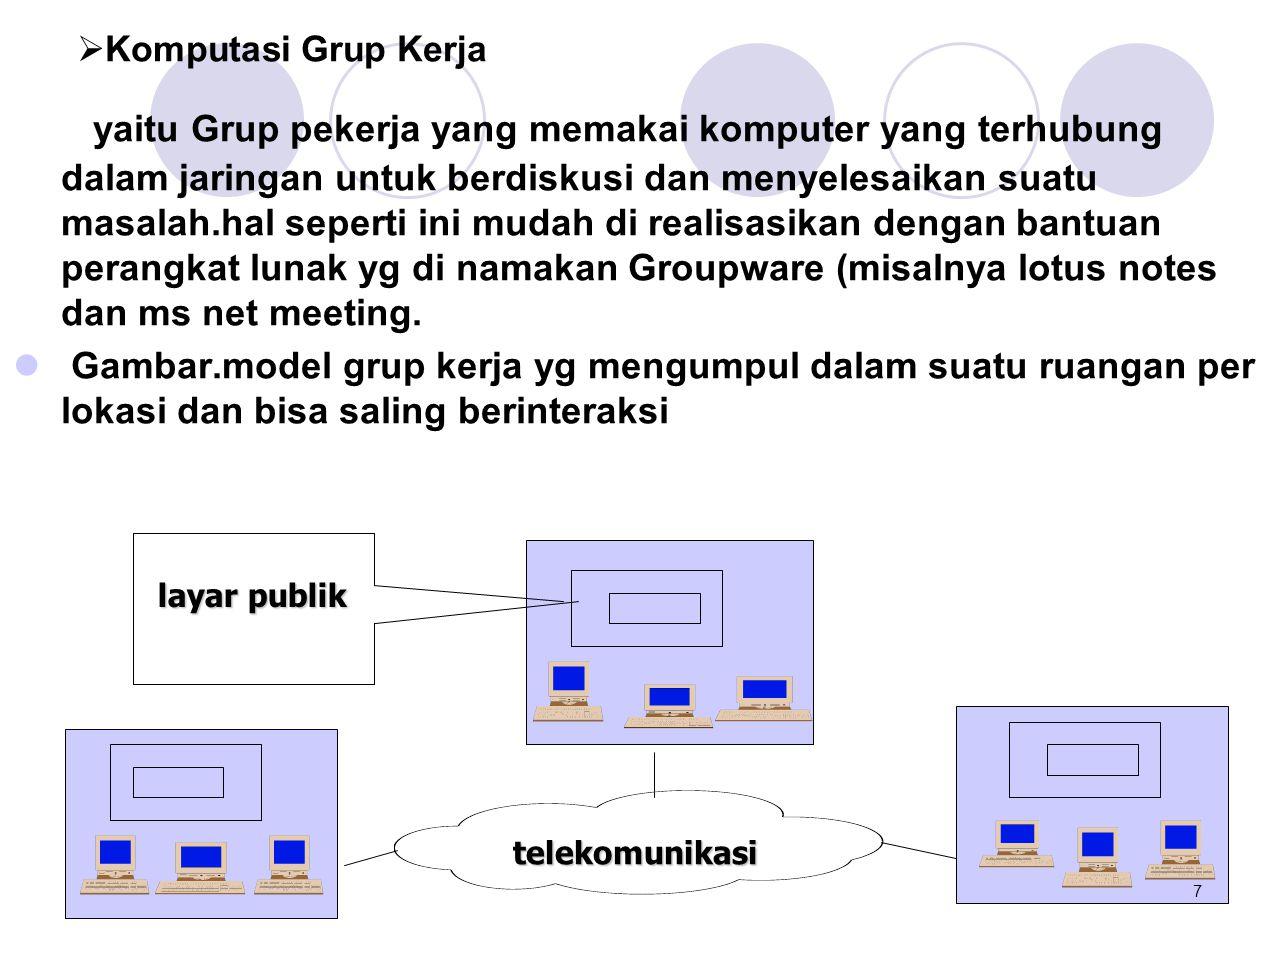  Komputasi Grup Kerja yaitu Grup pekerja yang memakai komputer yang terhubung dalam jaringan untuk berdiskusi dan menyelesaikan suatu masalah.hal sep